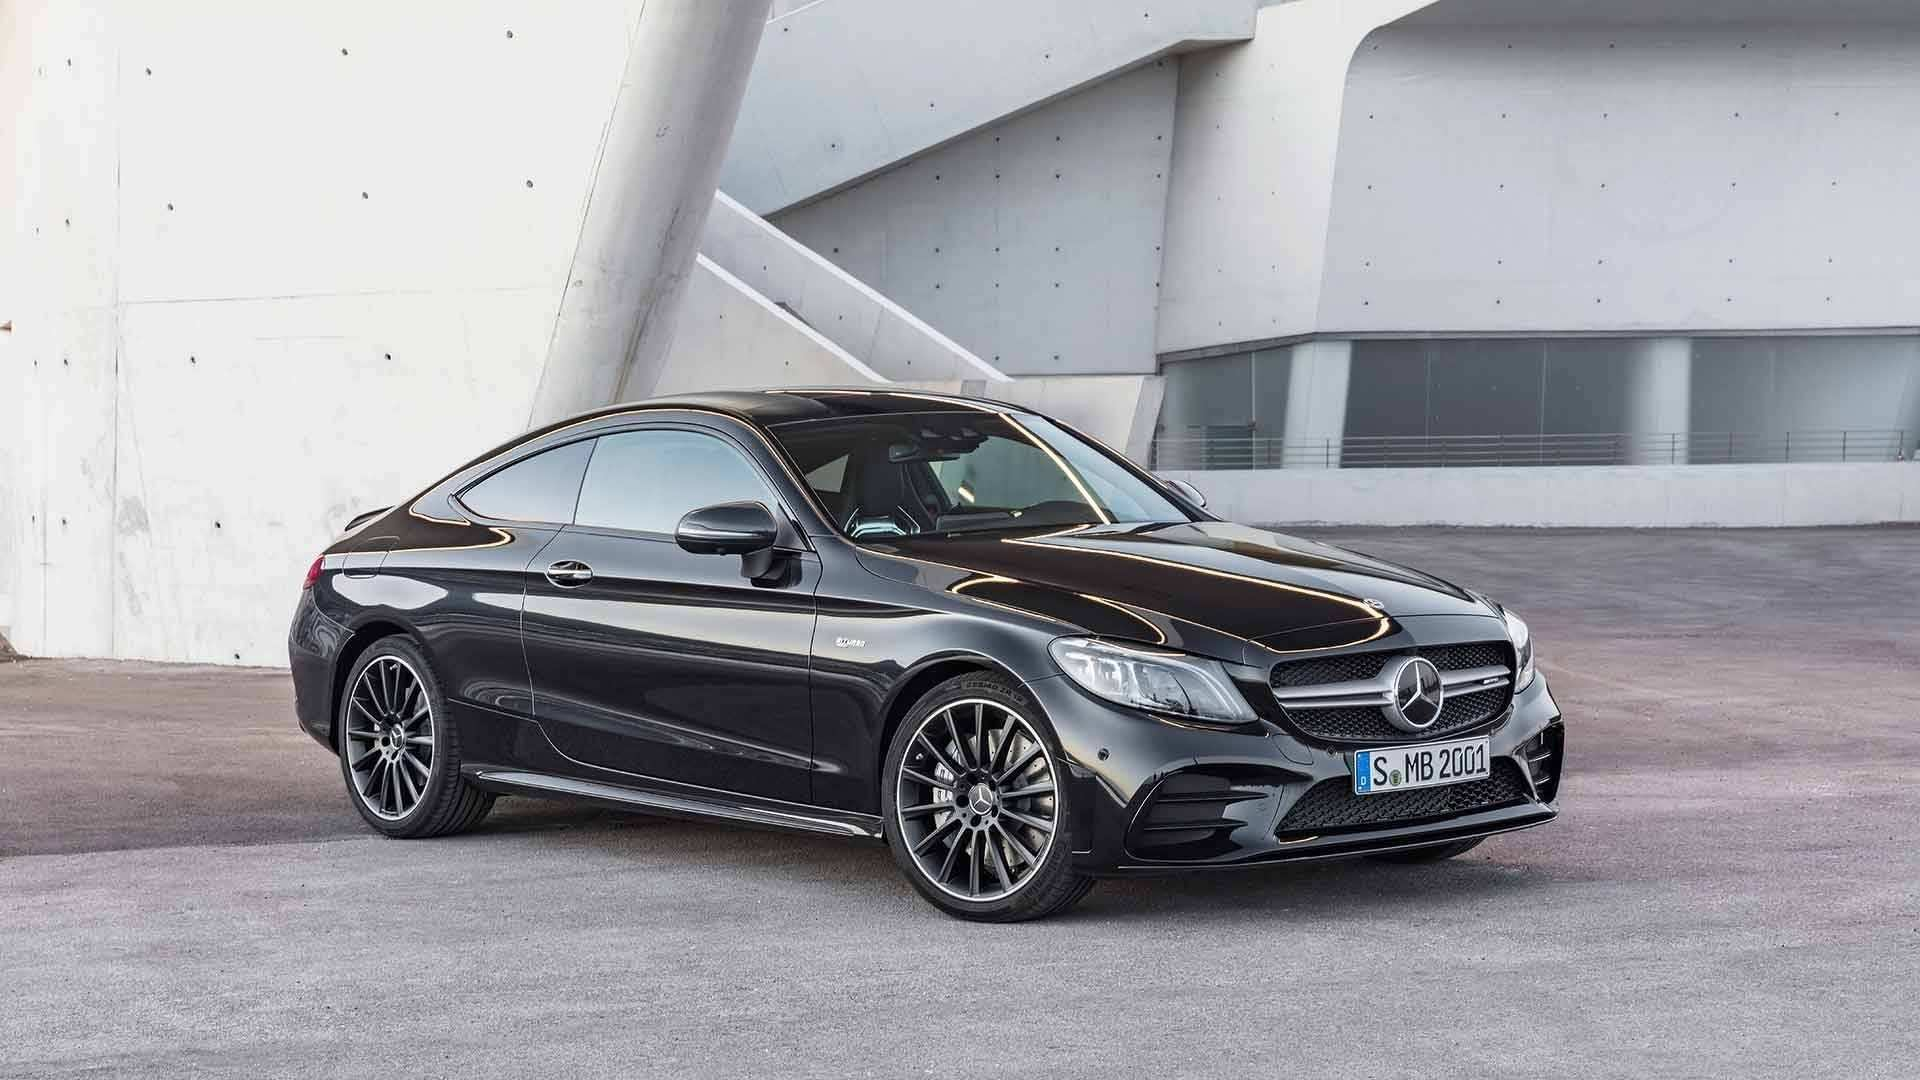 23 Best Review Best Mercedes 2019 Precio Concept Redesign And Review Specs for Best Mercedes 2019 Precio Concept Redesign And Review